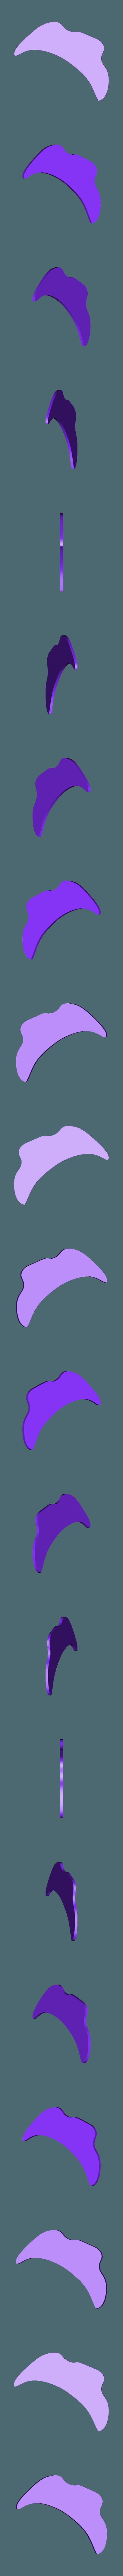 Comb.stl Download free STL file Chicken - Harvest Moon • 3D printer object, JayOmega